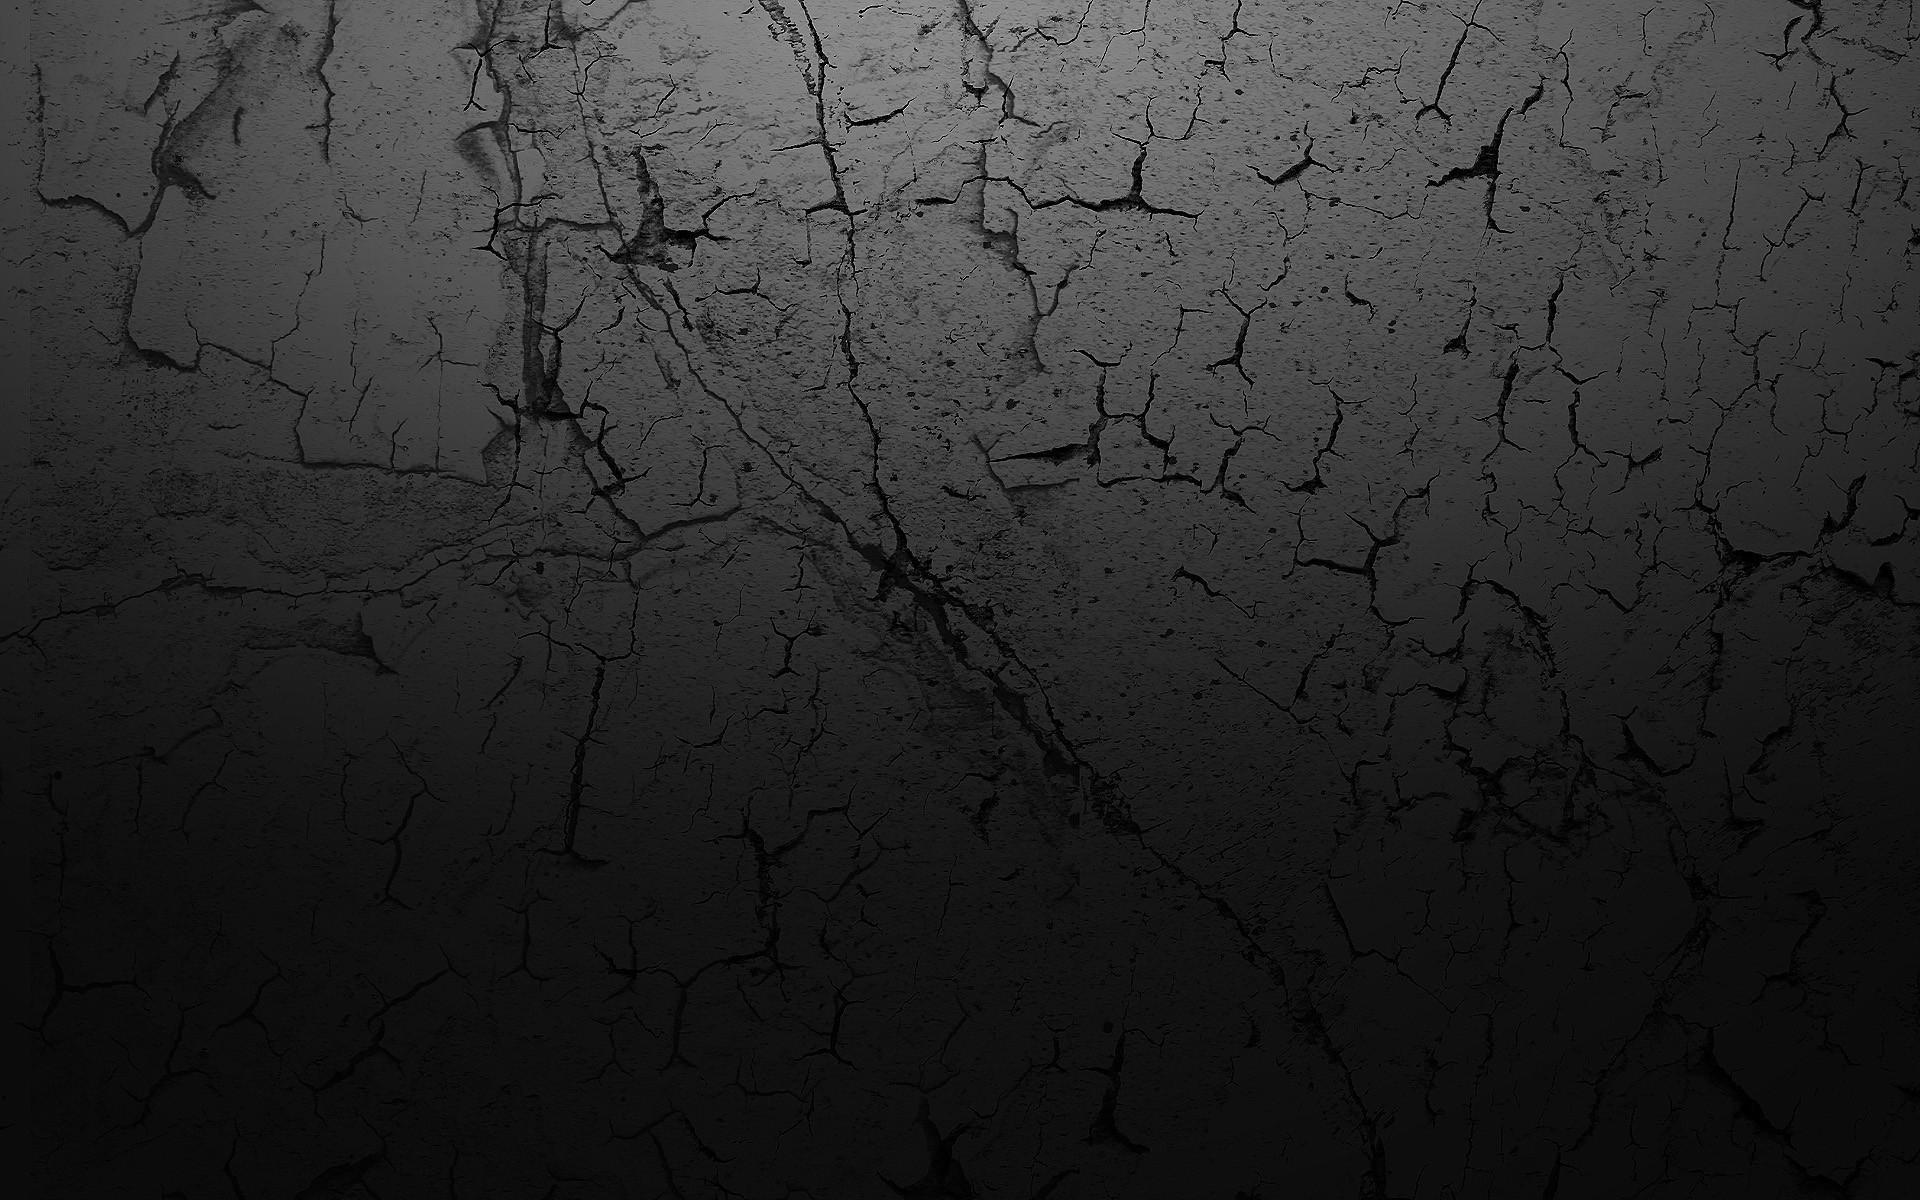 Cracked Texture Abstract HD desktop wallpaper, Texture wallpaper, Crack  wallpaper – Abstract no.